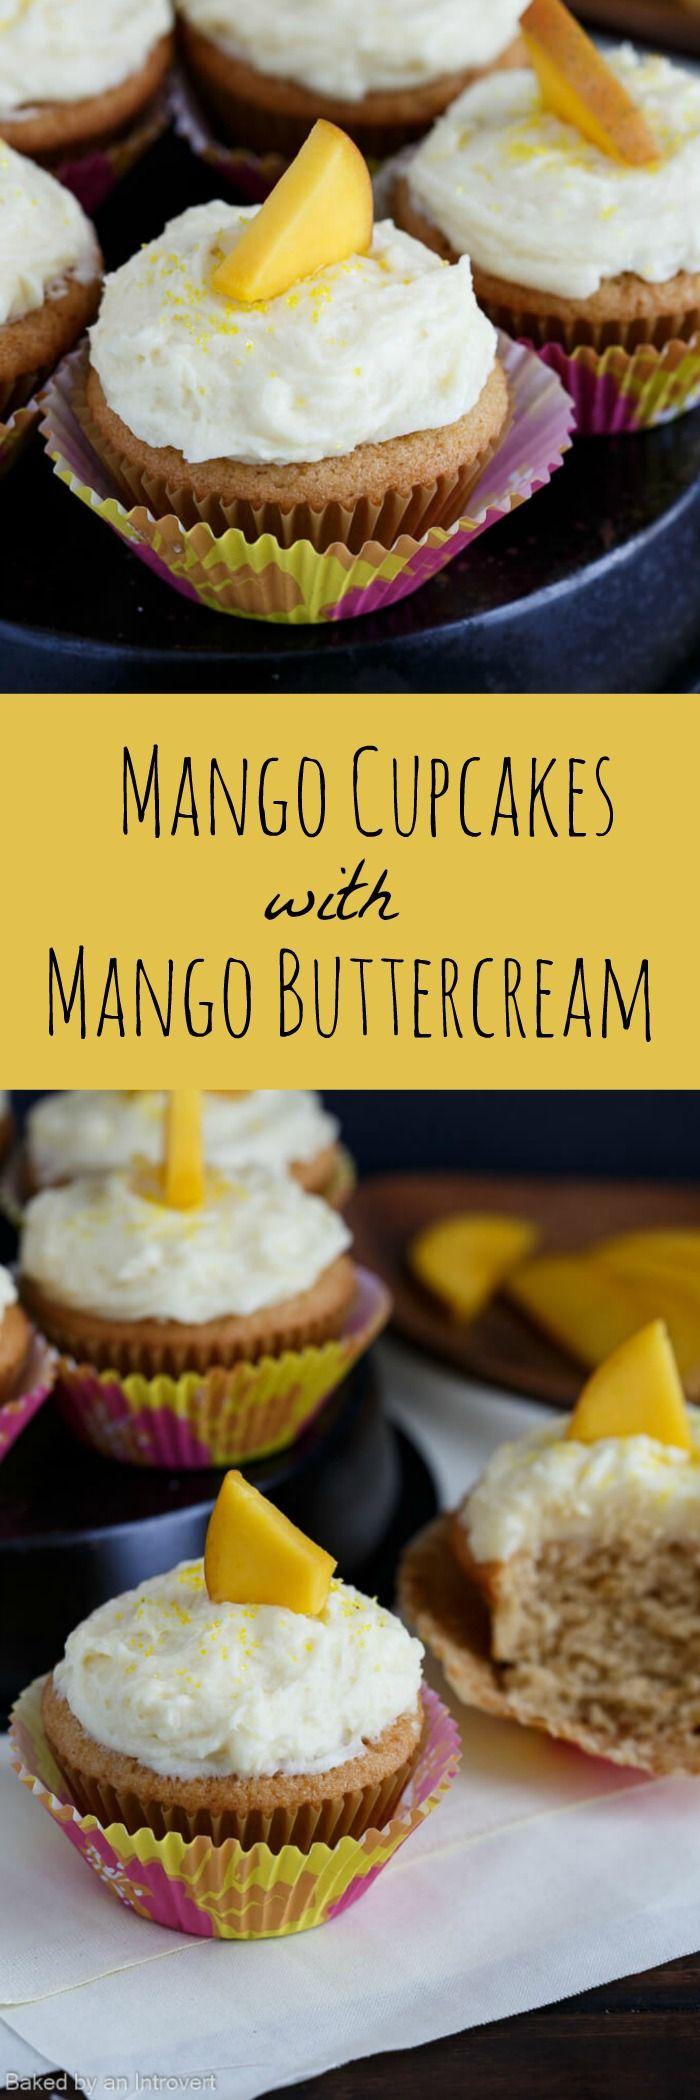 Mango Cupcakes with Mango Buttercream Frosting!